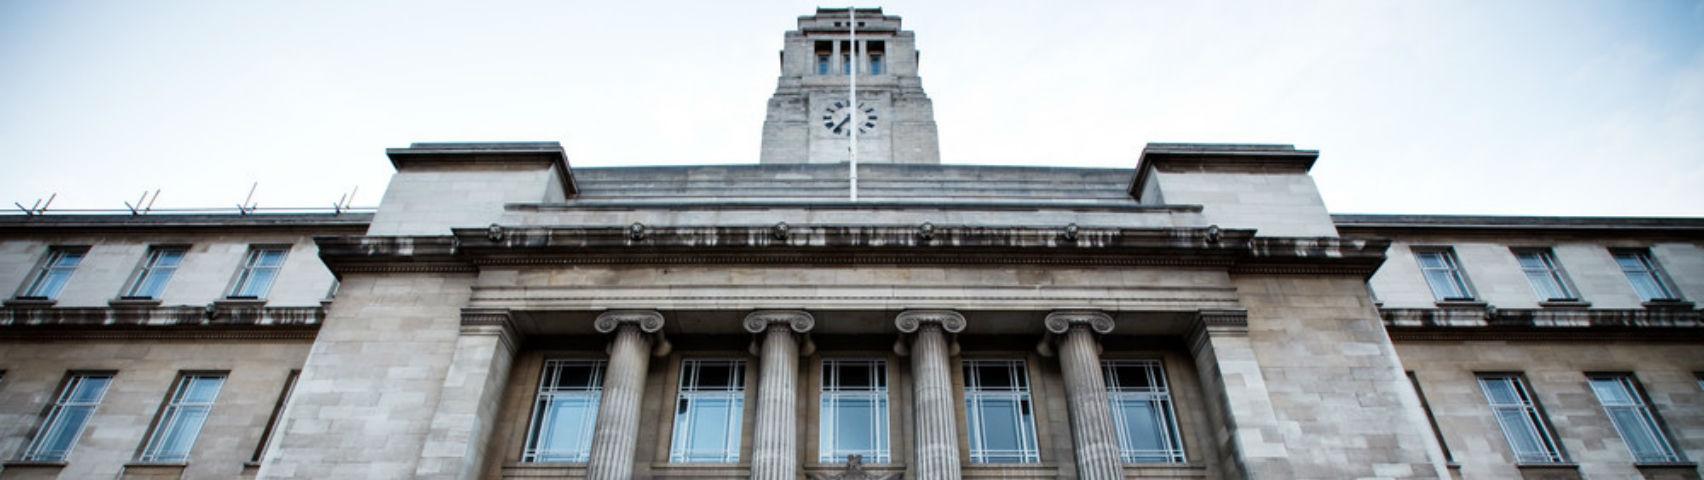 Parkingson building, University of Leeds